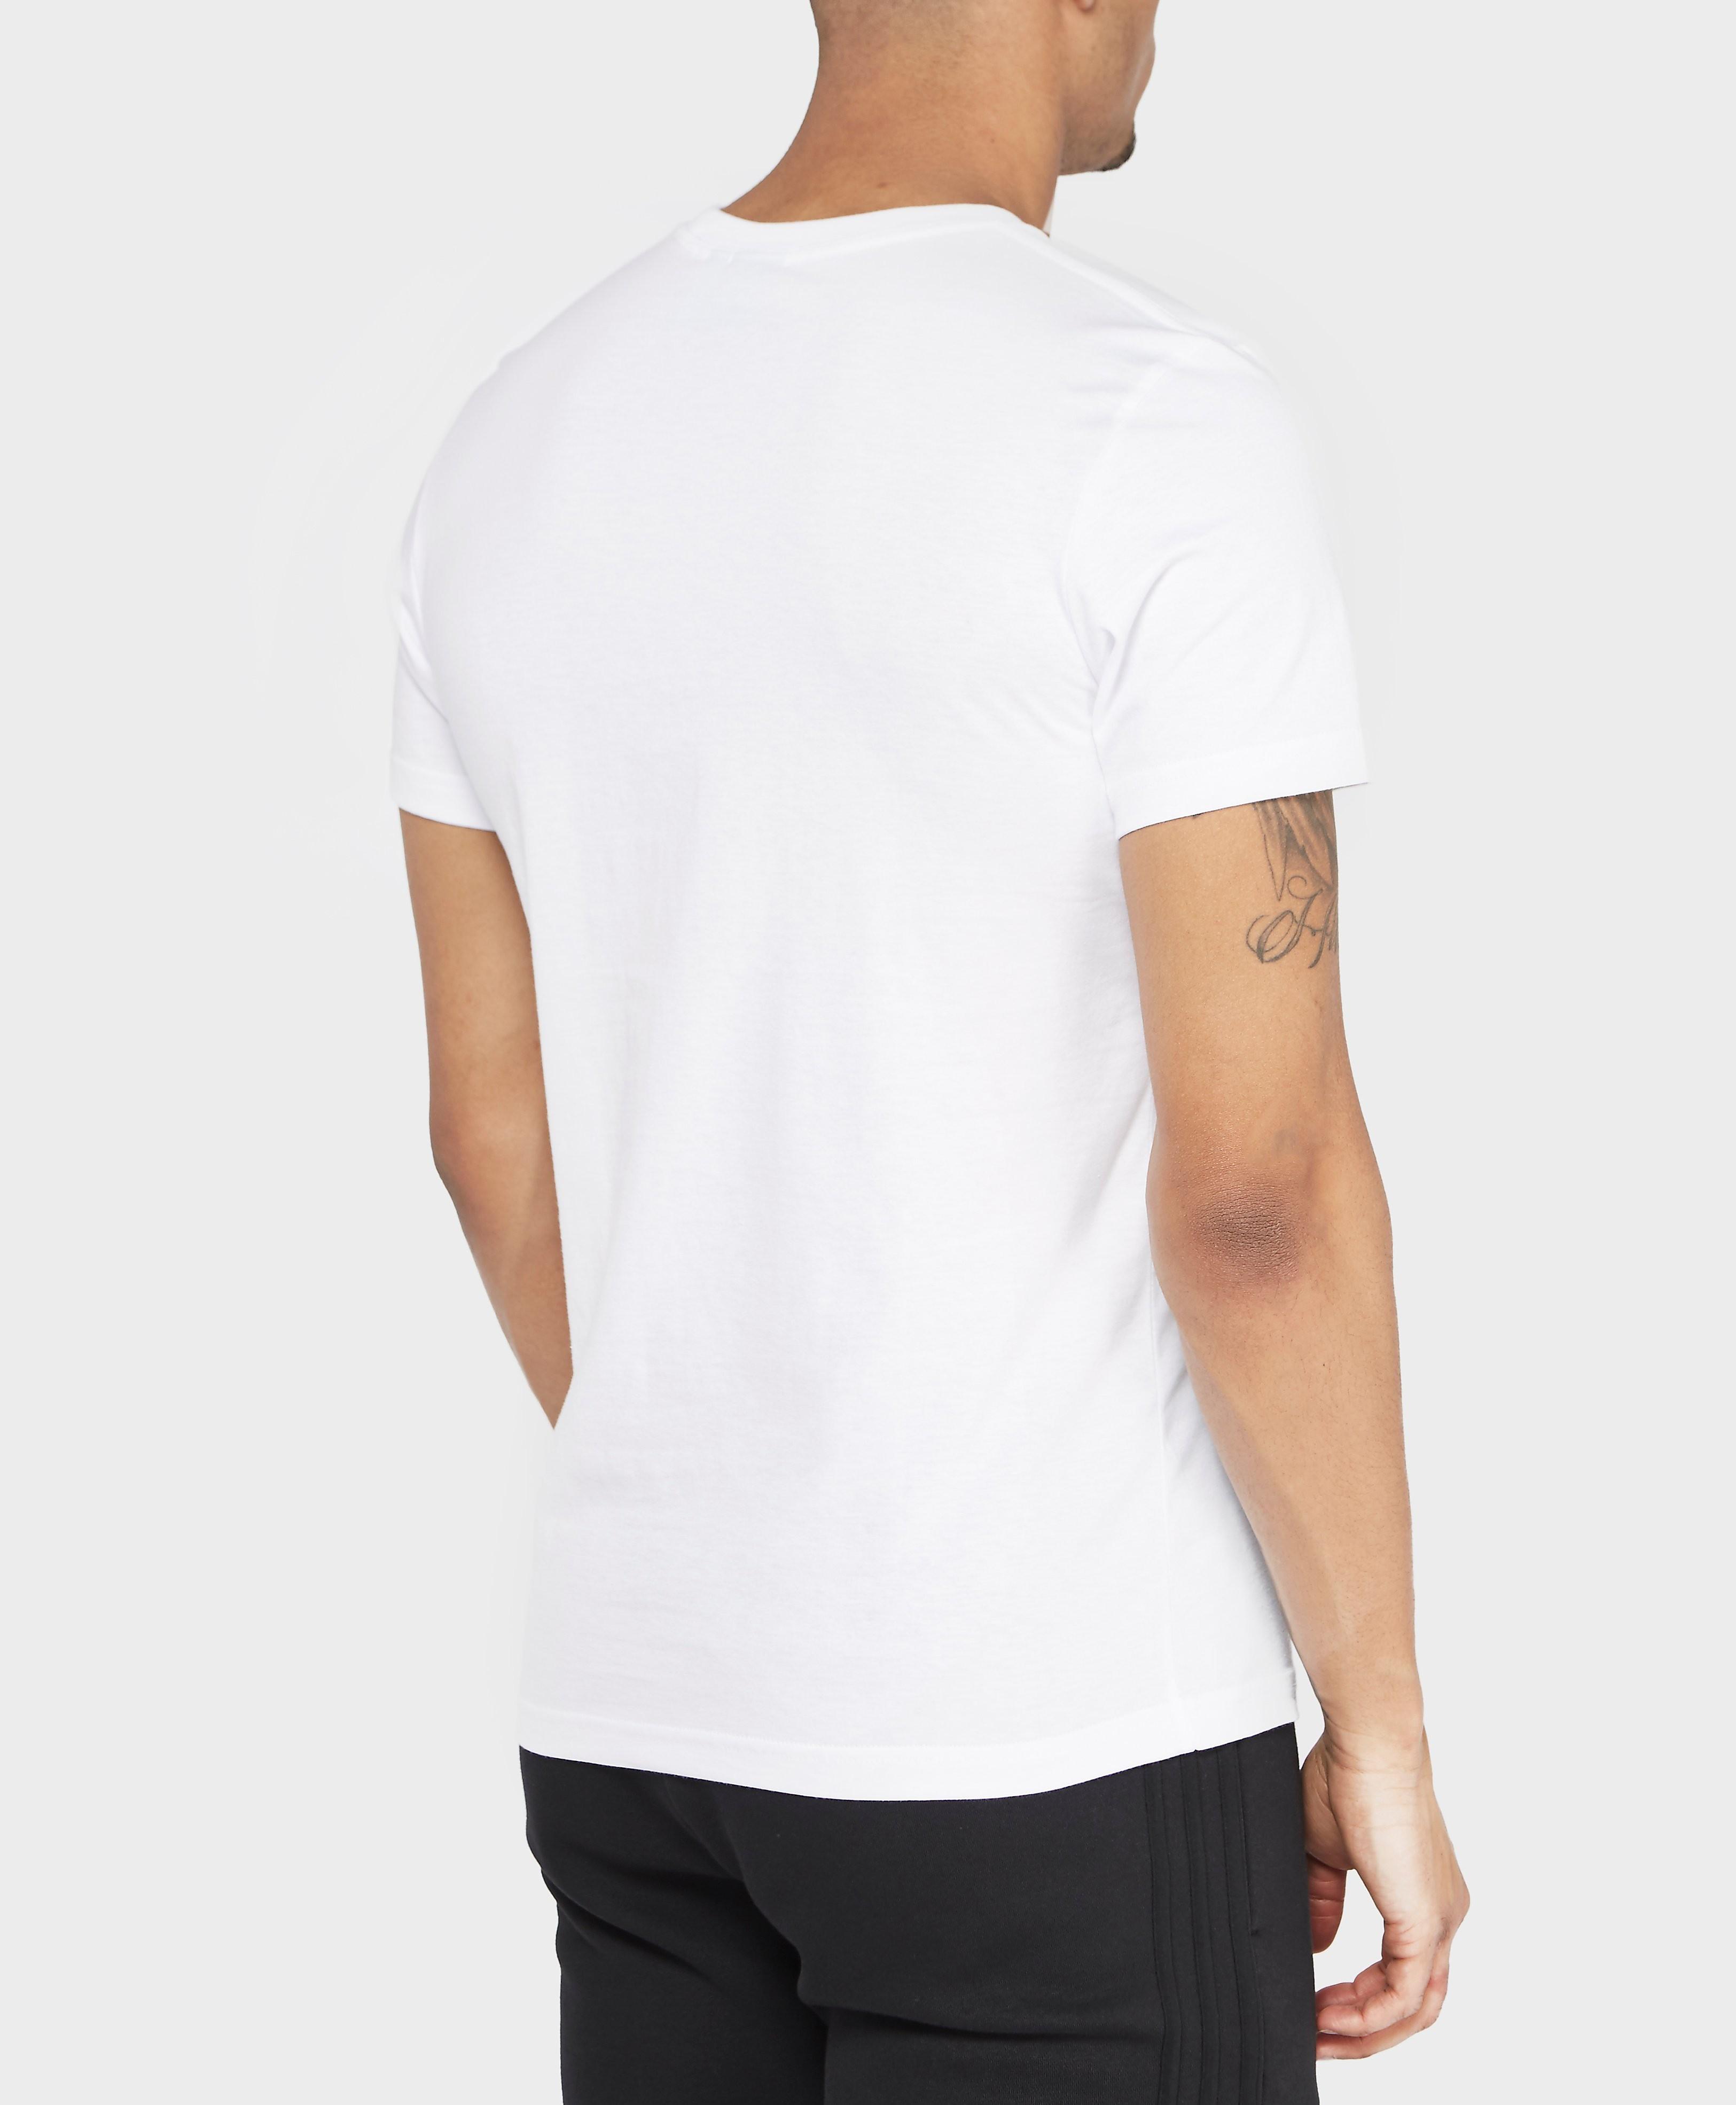 adidas Originals Berlin City Short Sleeve T-Shirt